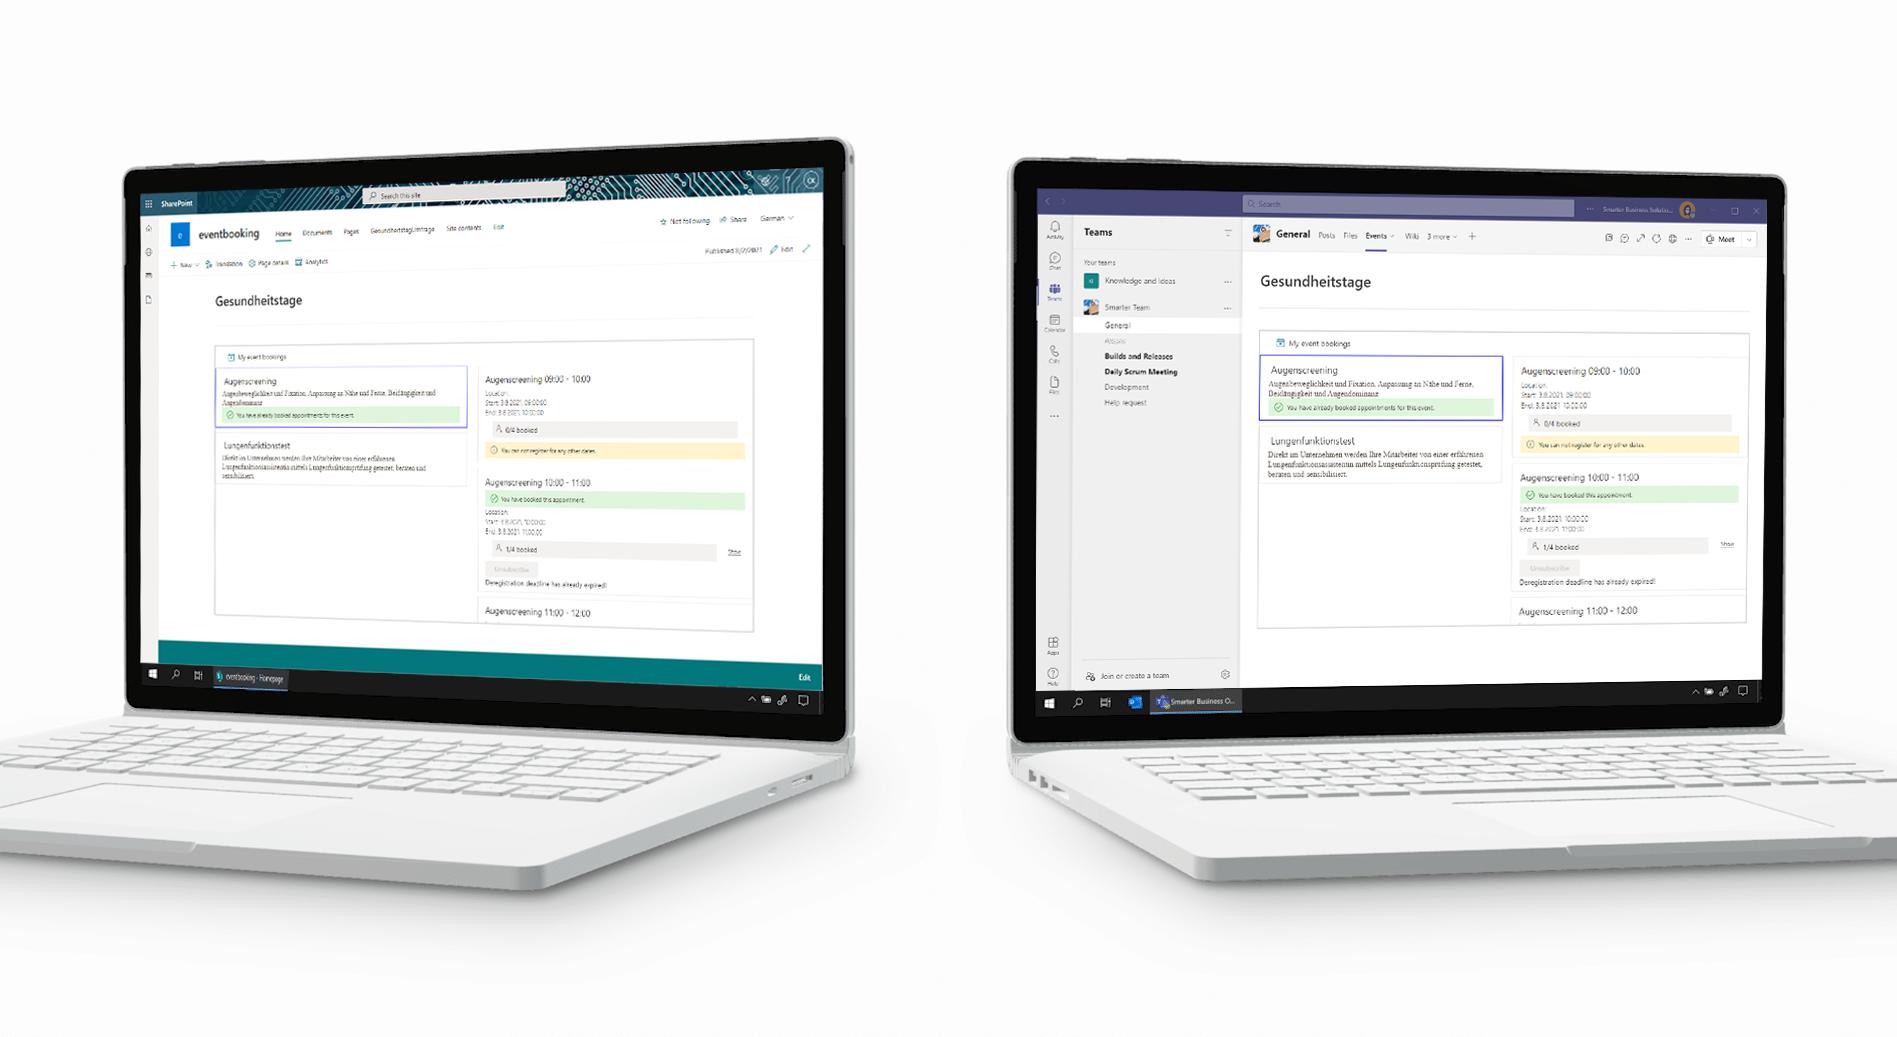 Veranstaltungs-Buchungen in Microsoft Teams